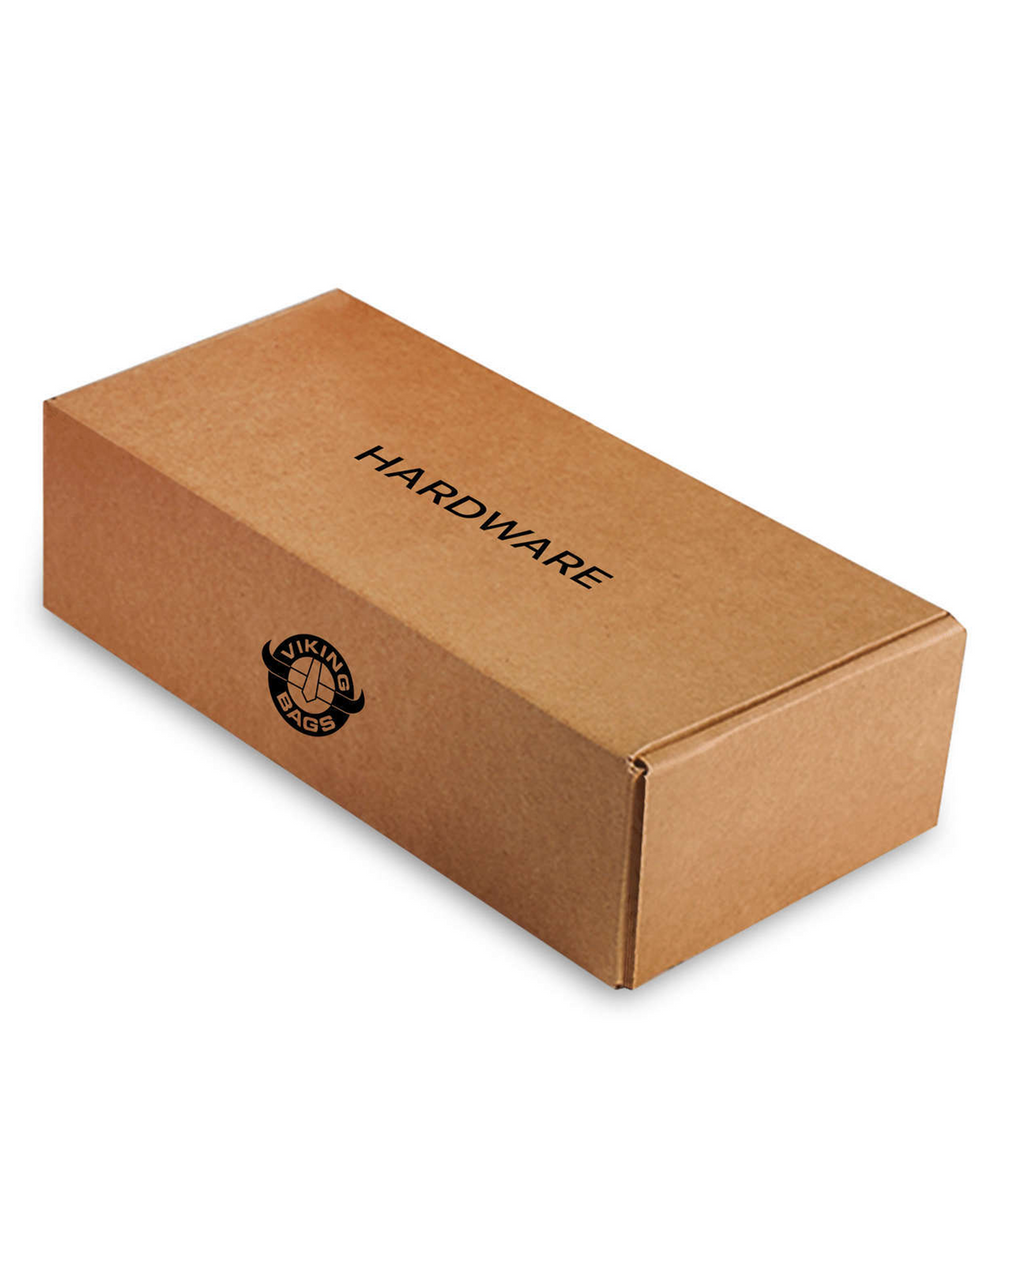 Viking Lamellar Large Leather Covered Hard Saddlebags For Harley Softail Custom FXSTC Hardware Box